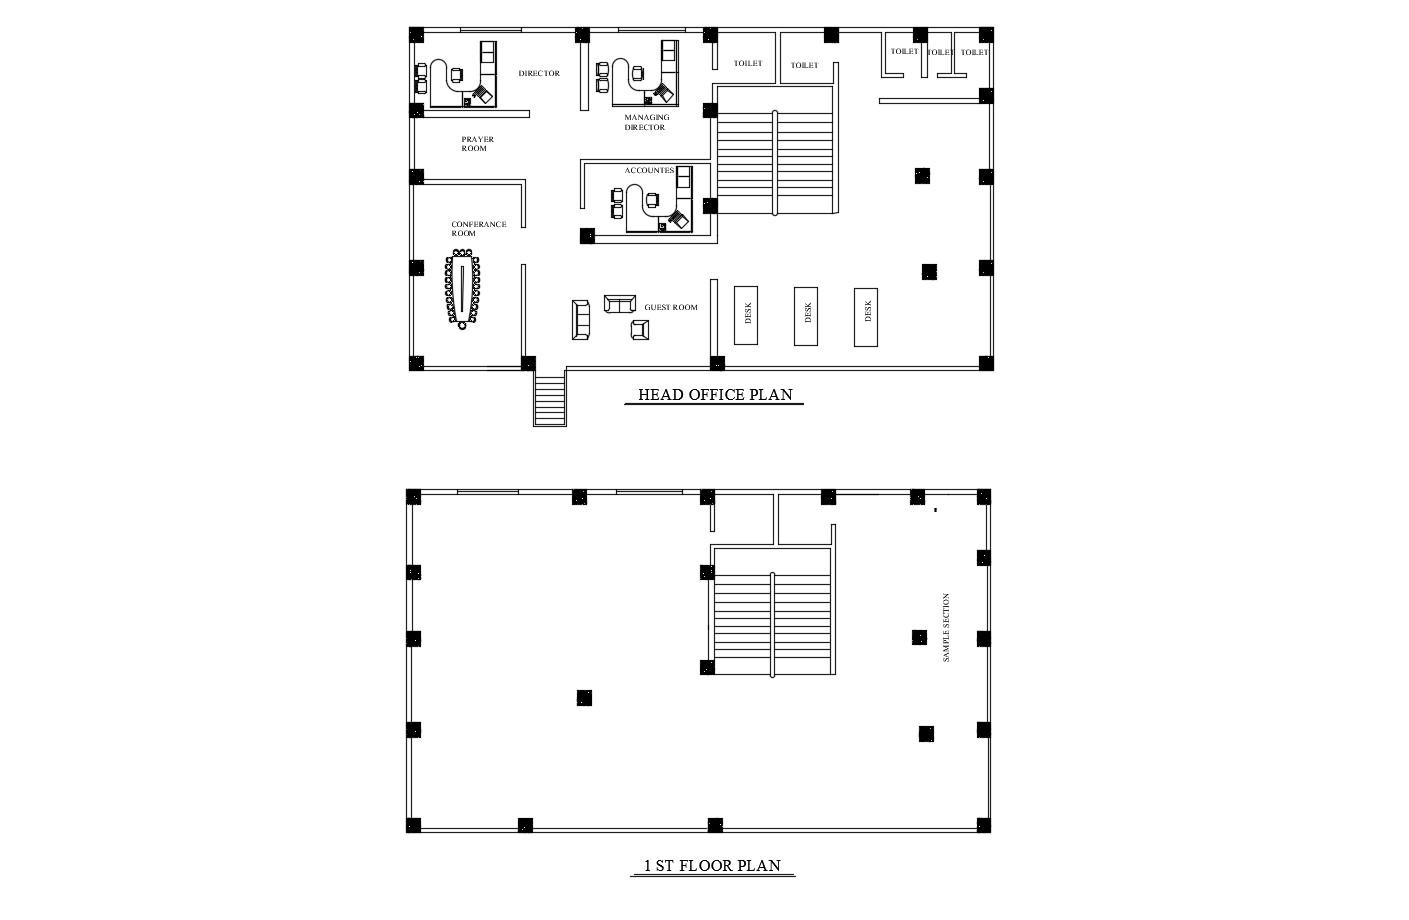 Office Building Floor Plan In AutoCAD File